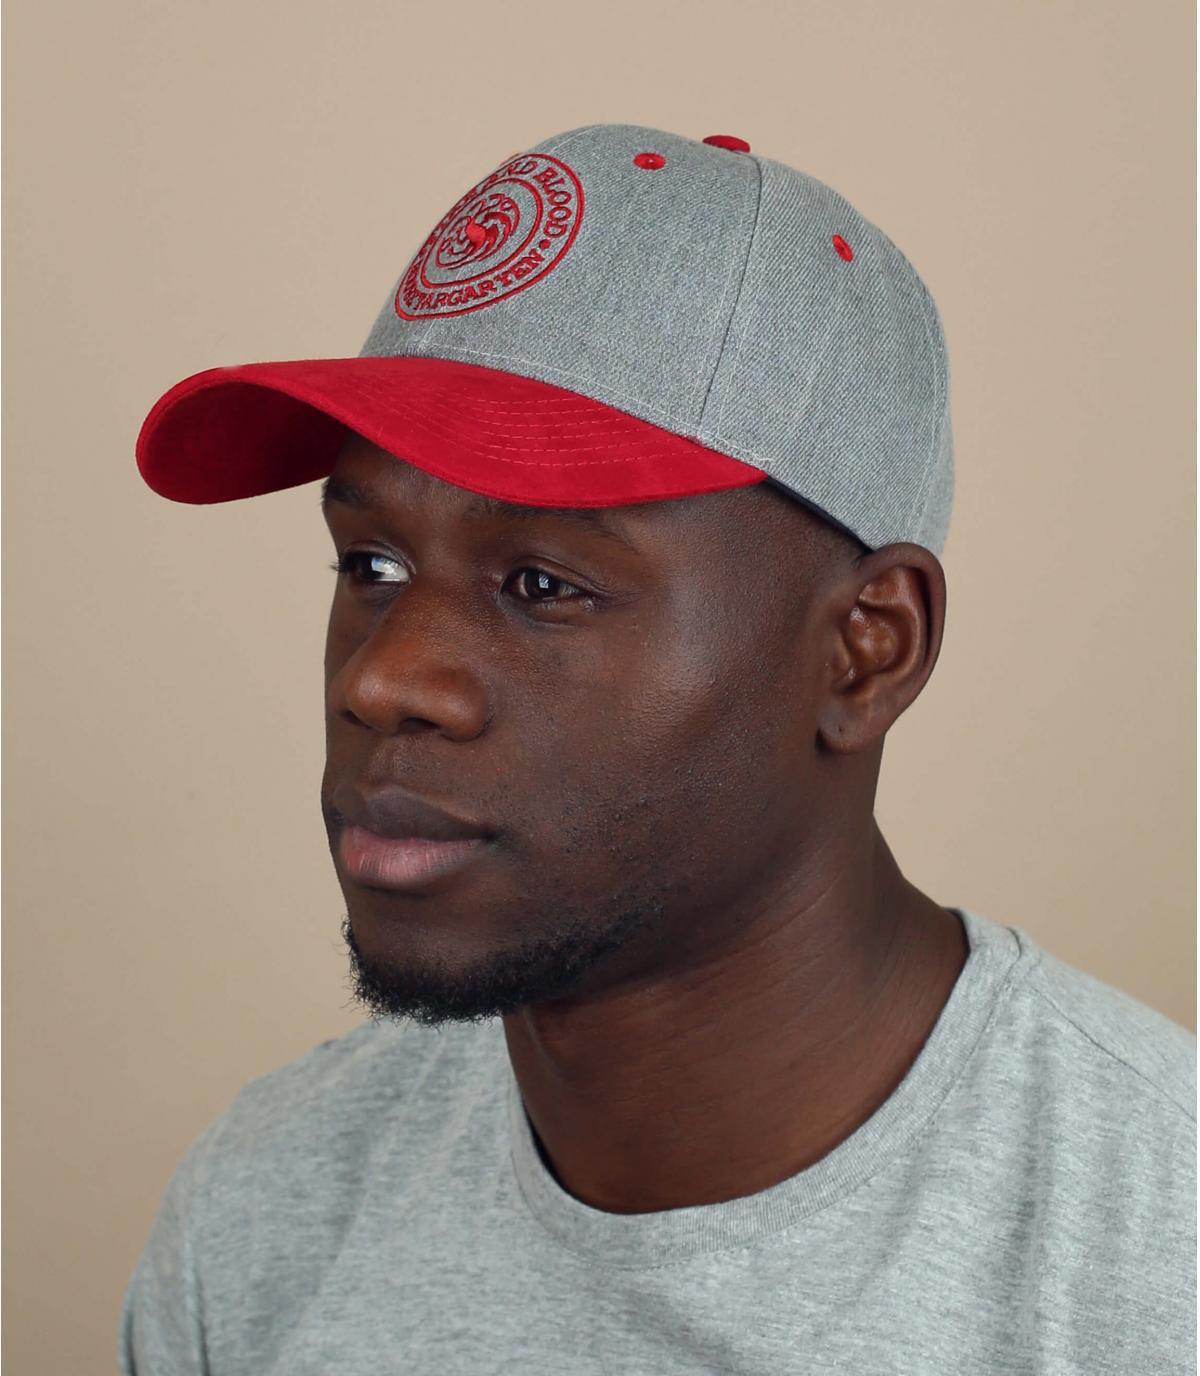 rood grijs Targaryen cap